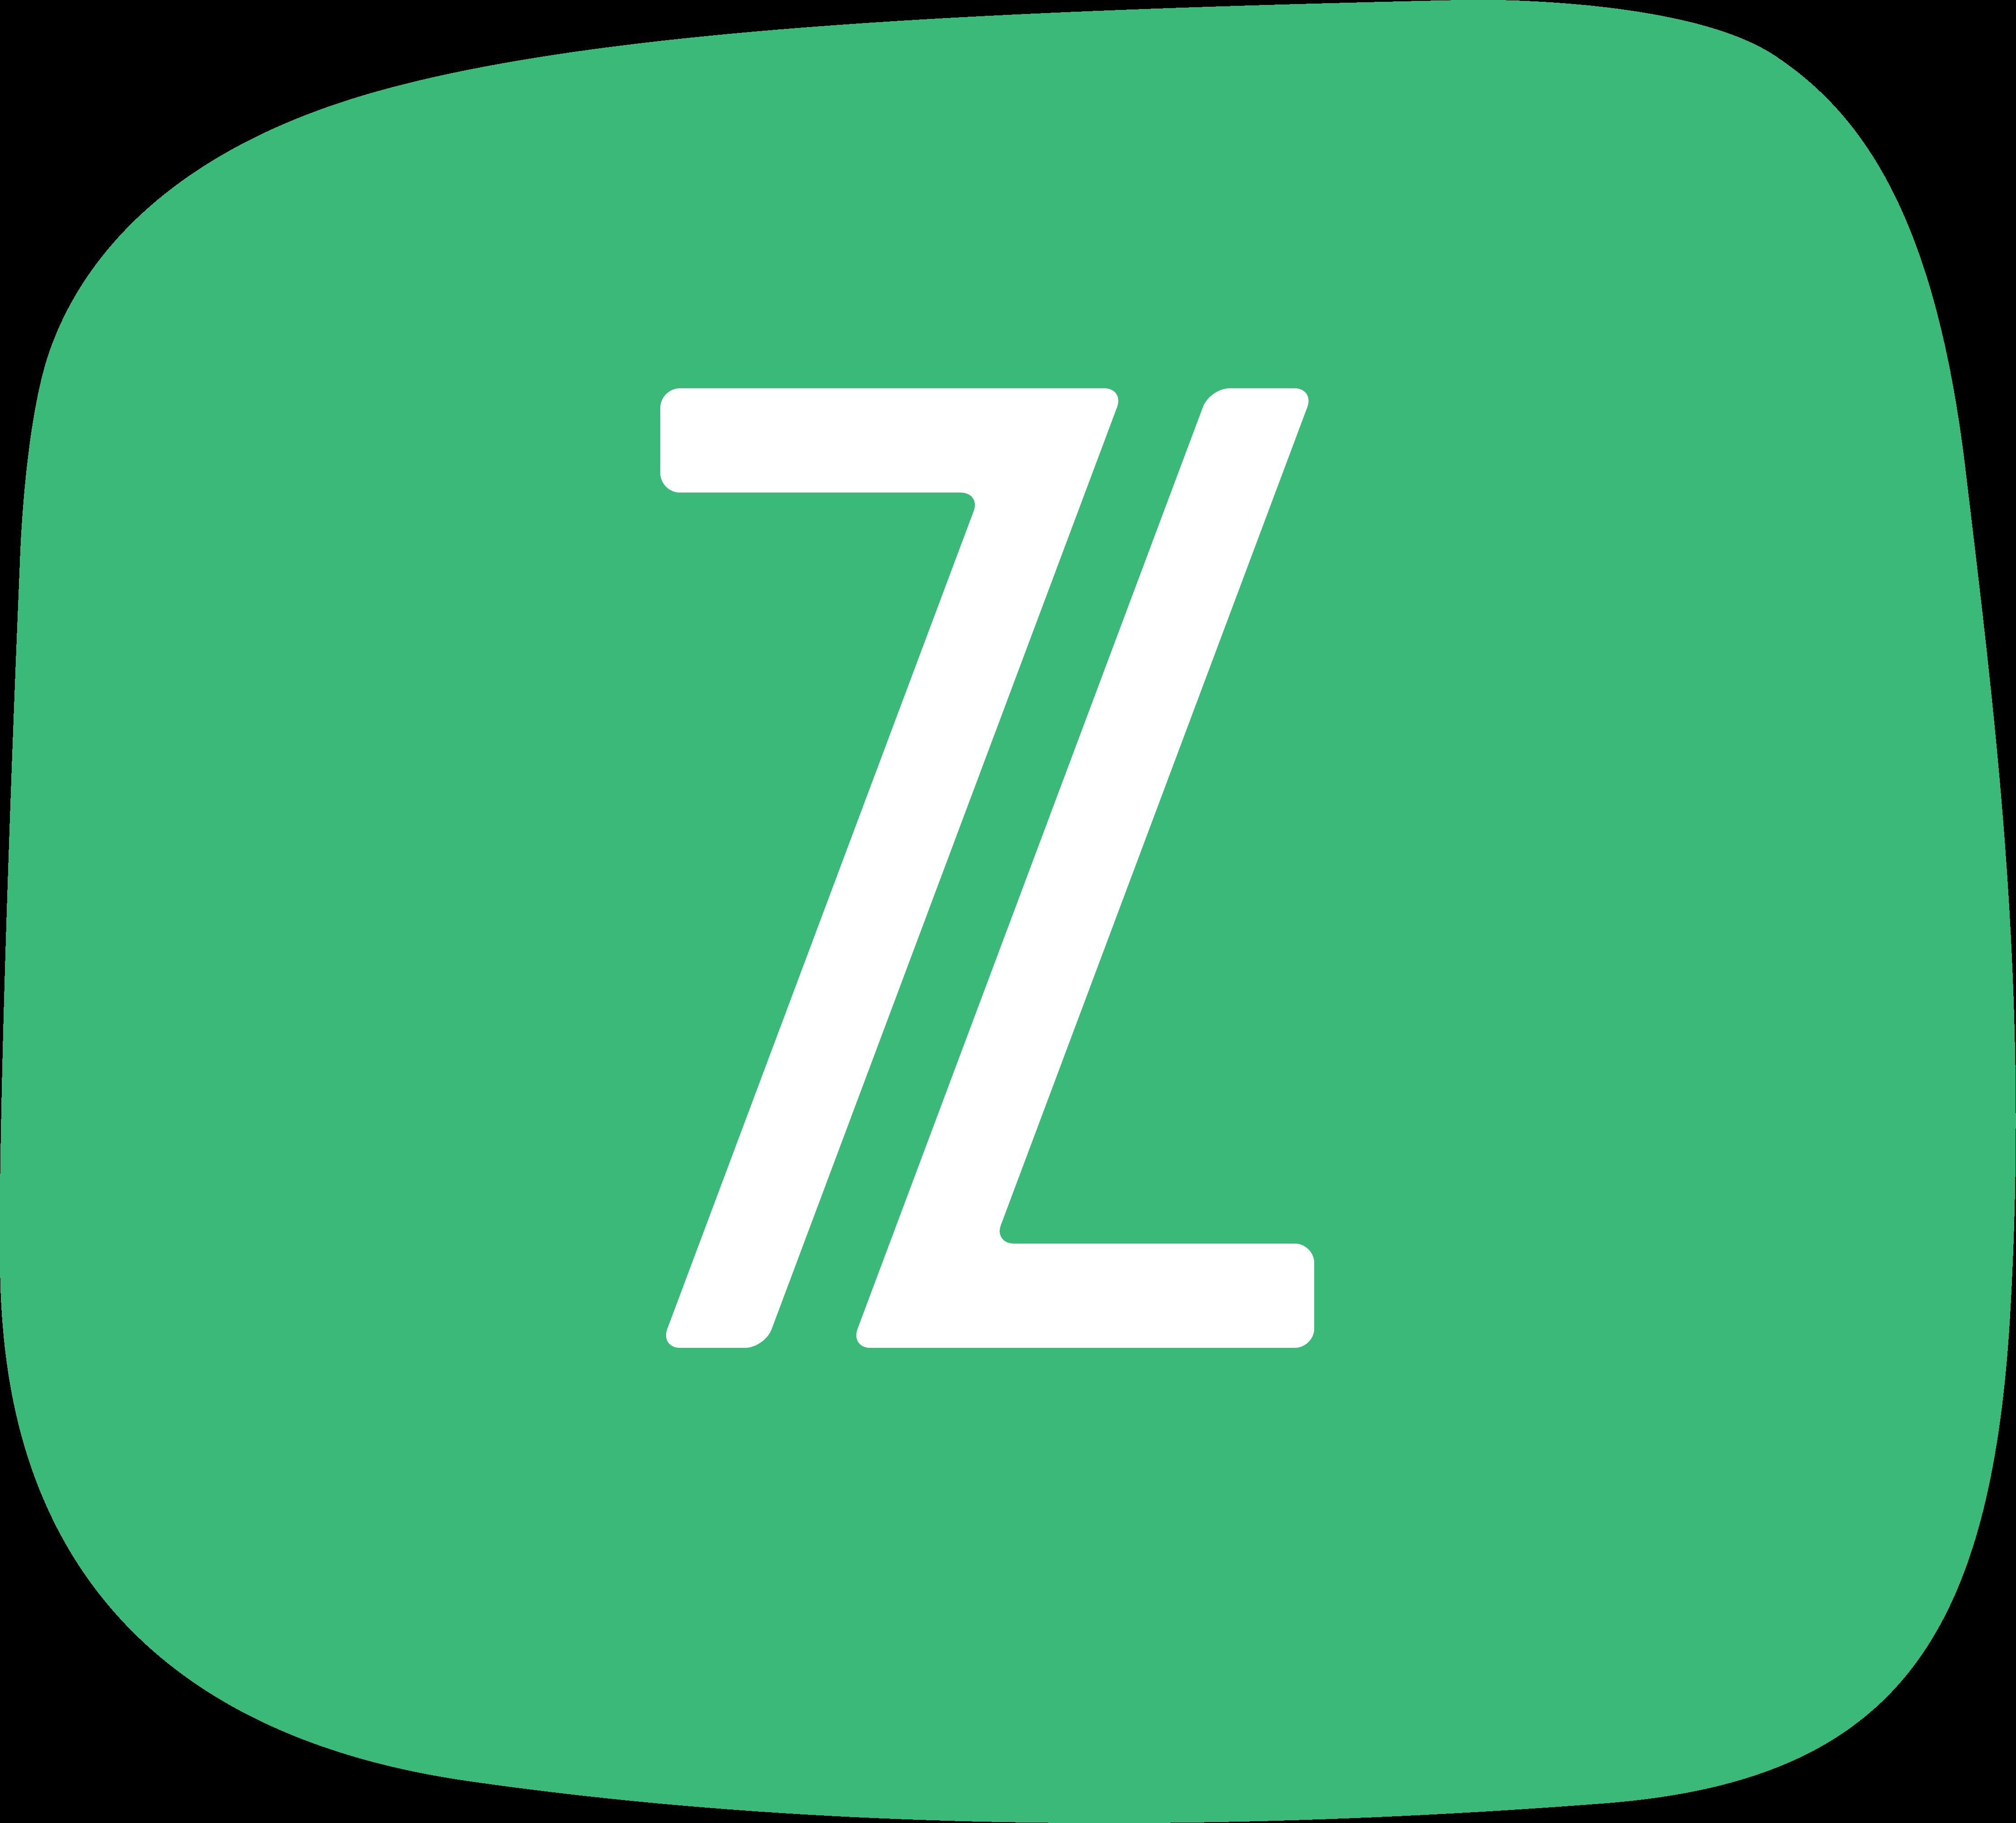 cropped-logo-zuzu-new-2.png